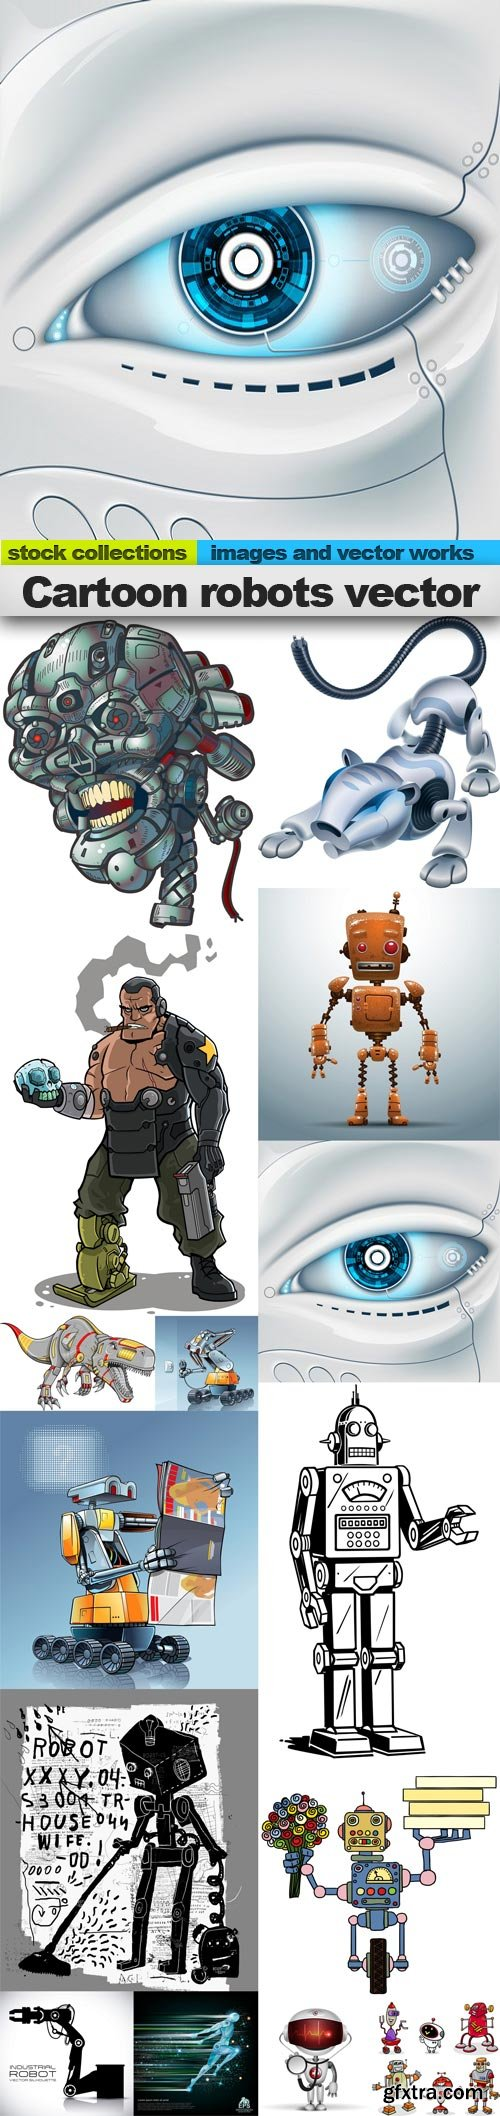 Cartoon robots vector, 15 x EPS